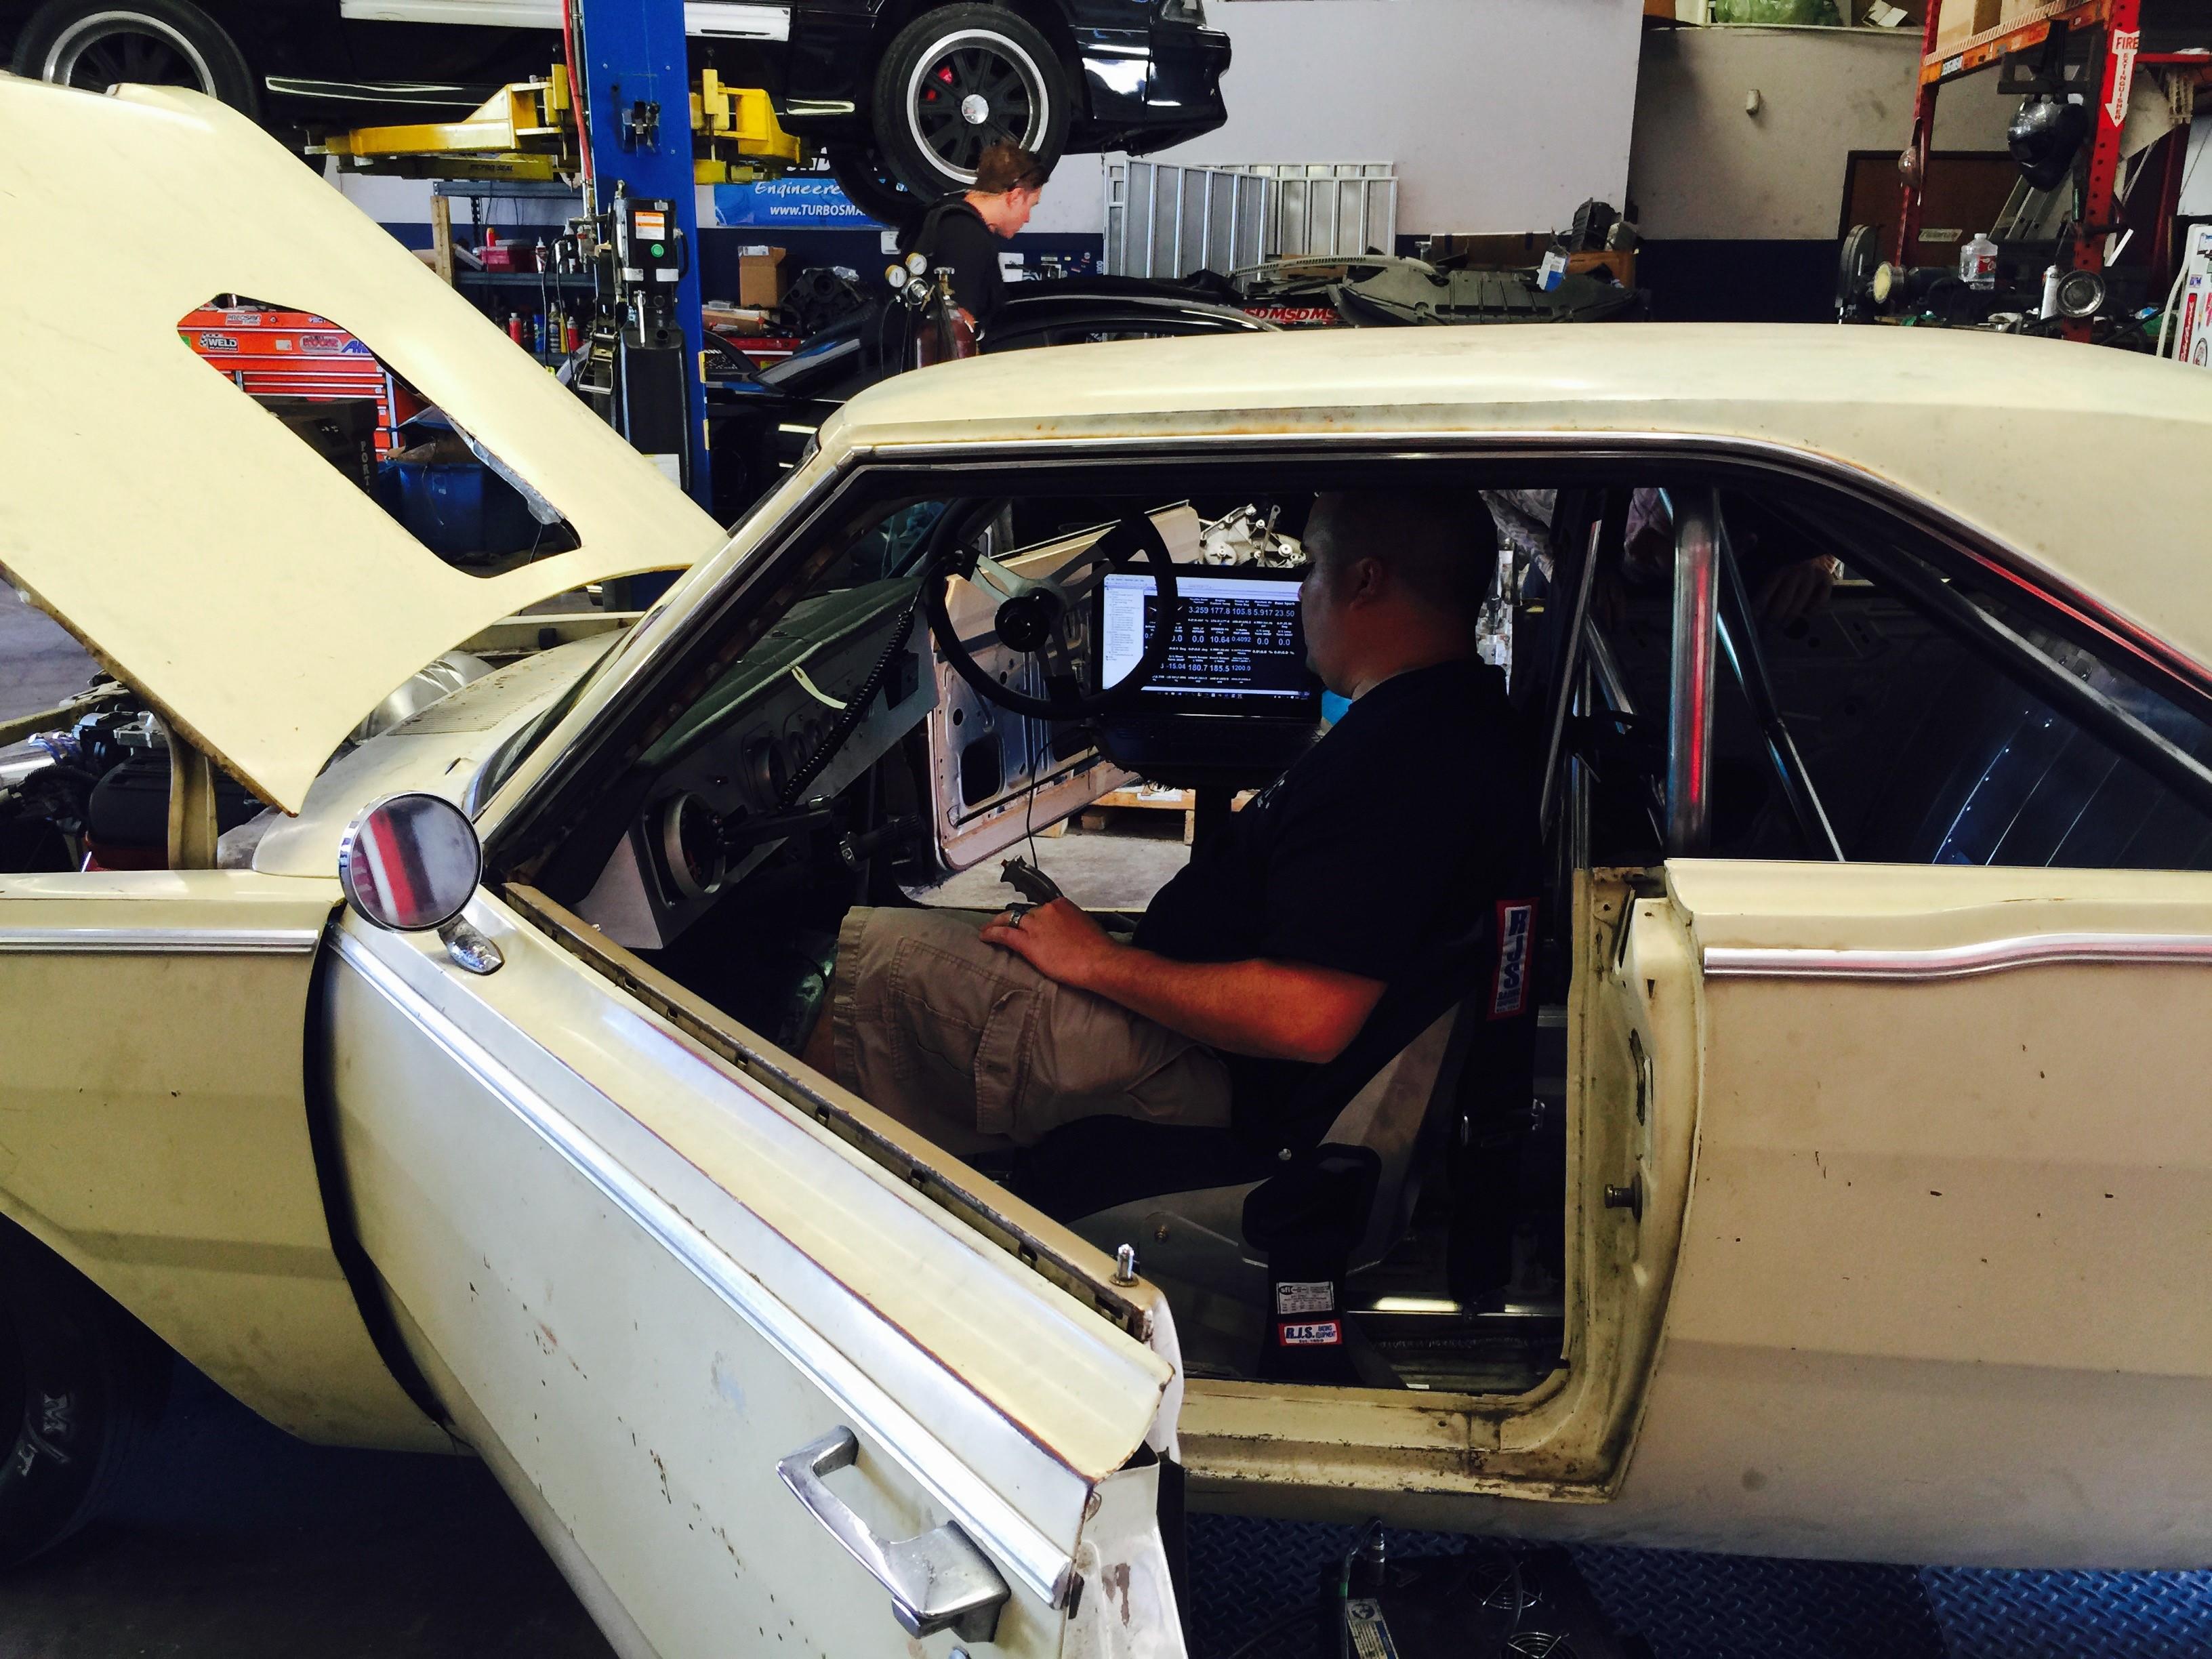 DiabloSport Helps Gas Monkey build winning Hellcat Swap car